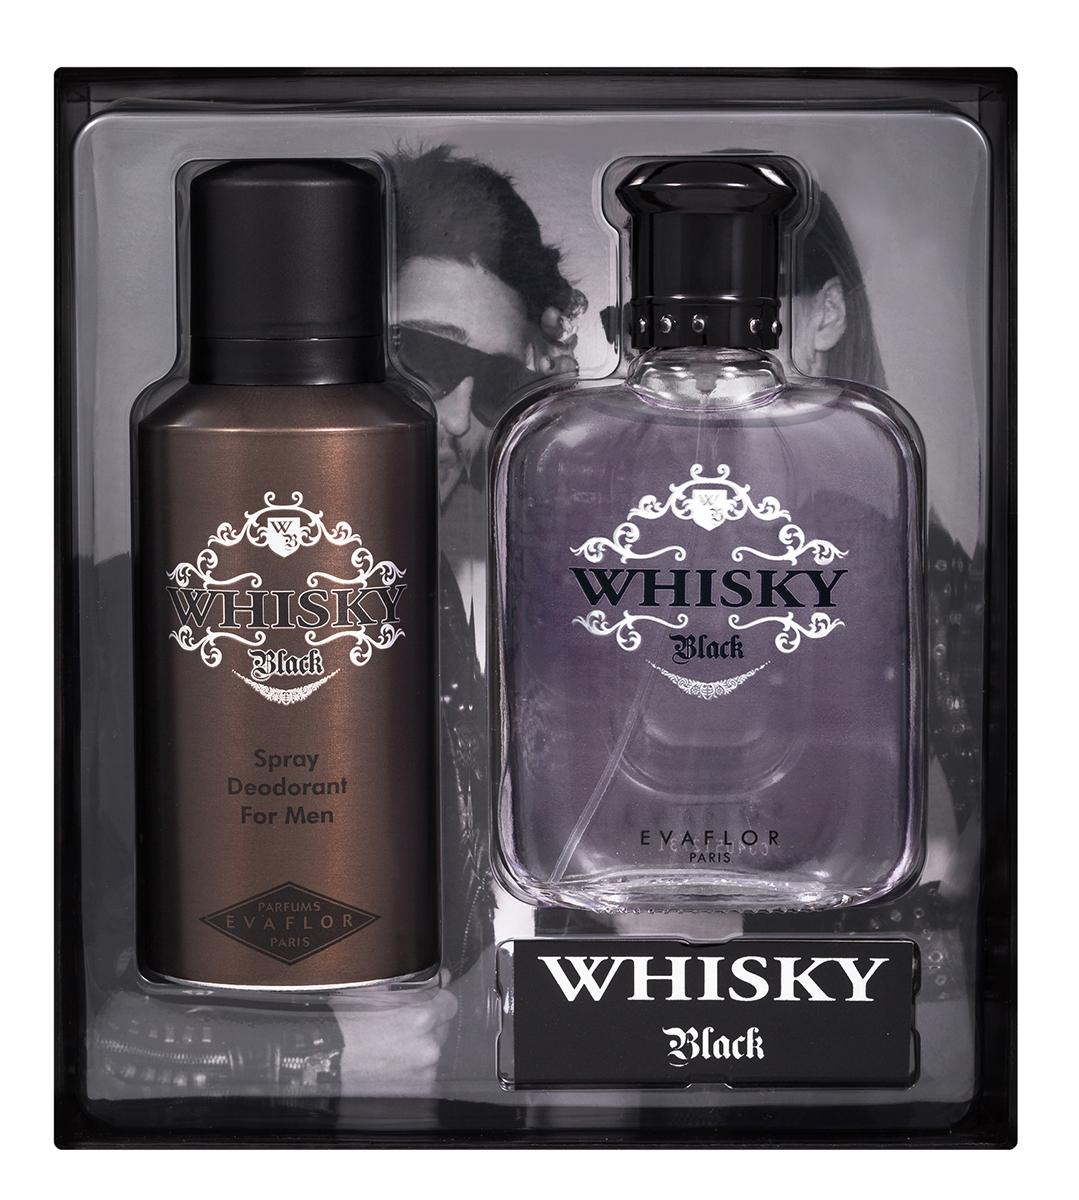 Evaflor Подарочный набор Whisky Black мужской: Туалетная вода, 100 мл , дезодорант, 150 мл1101Подарочный набор для мужчин : туалетная вода 100мл, парфюмированный дезодорант 150 мл.